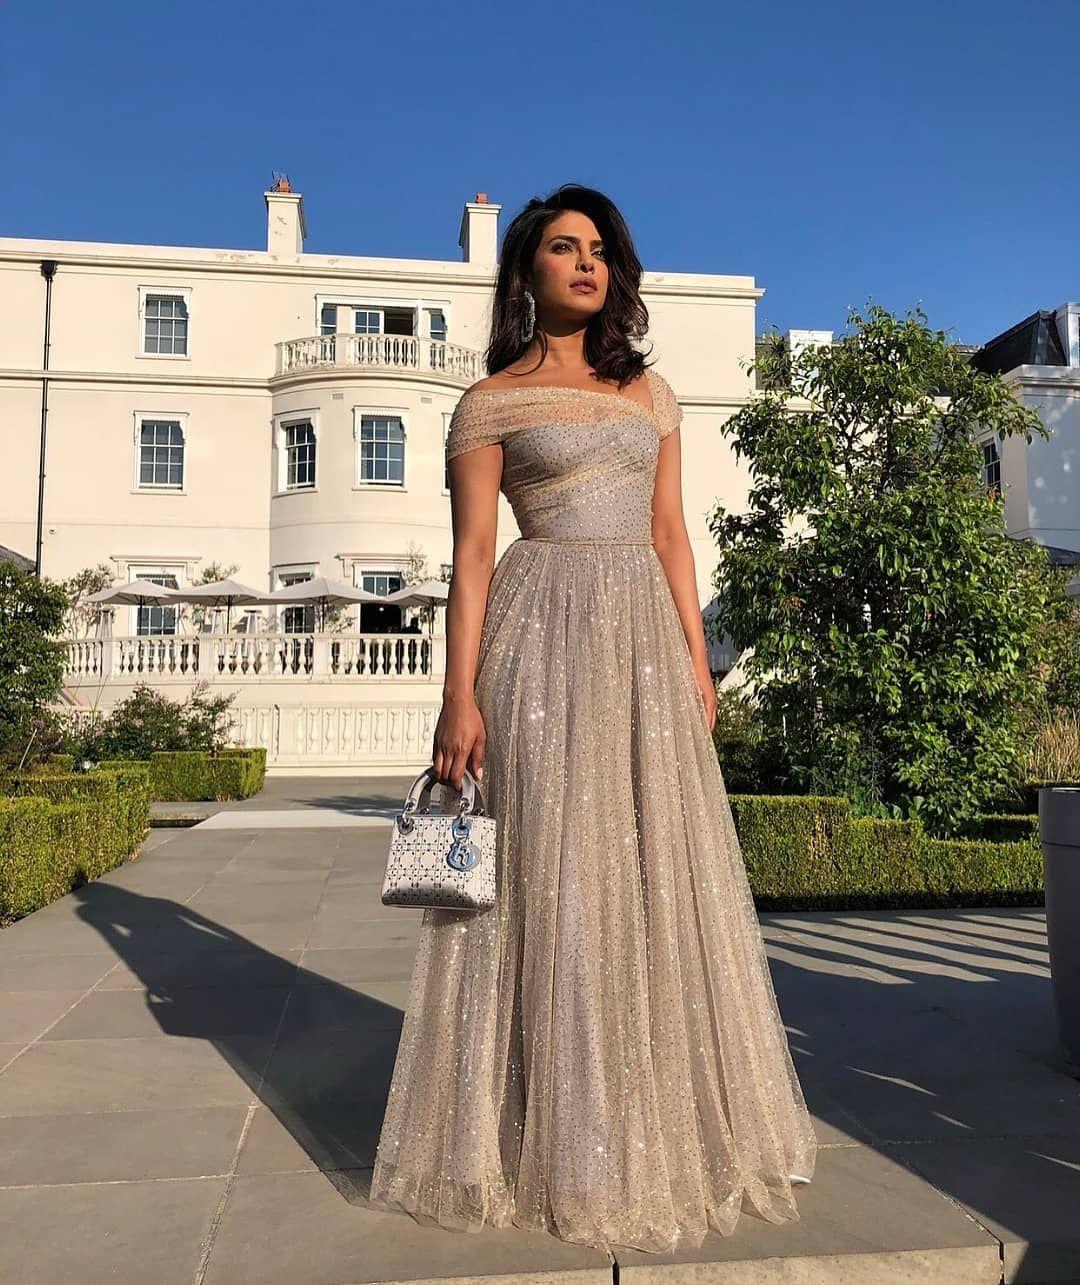 Priyanka Wedding White Gown: Priyanka Chopra For The Royal Wedding Reception